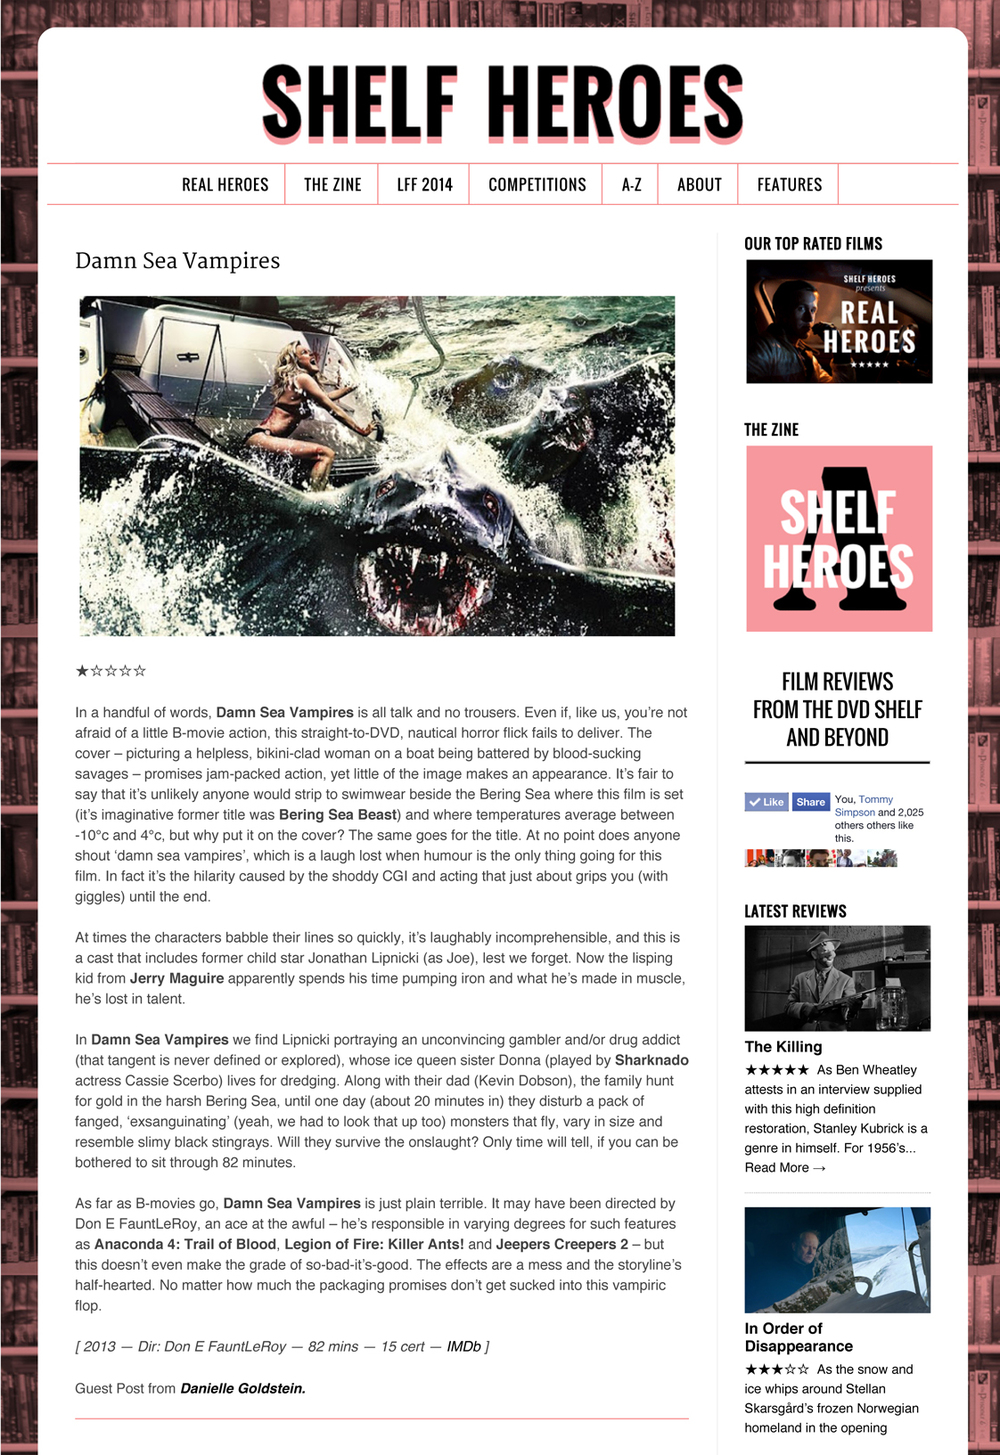 Damn Sea Vampires _ Film Review _ Movie Review _ SHELF HEROES.jpg